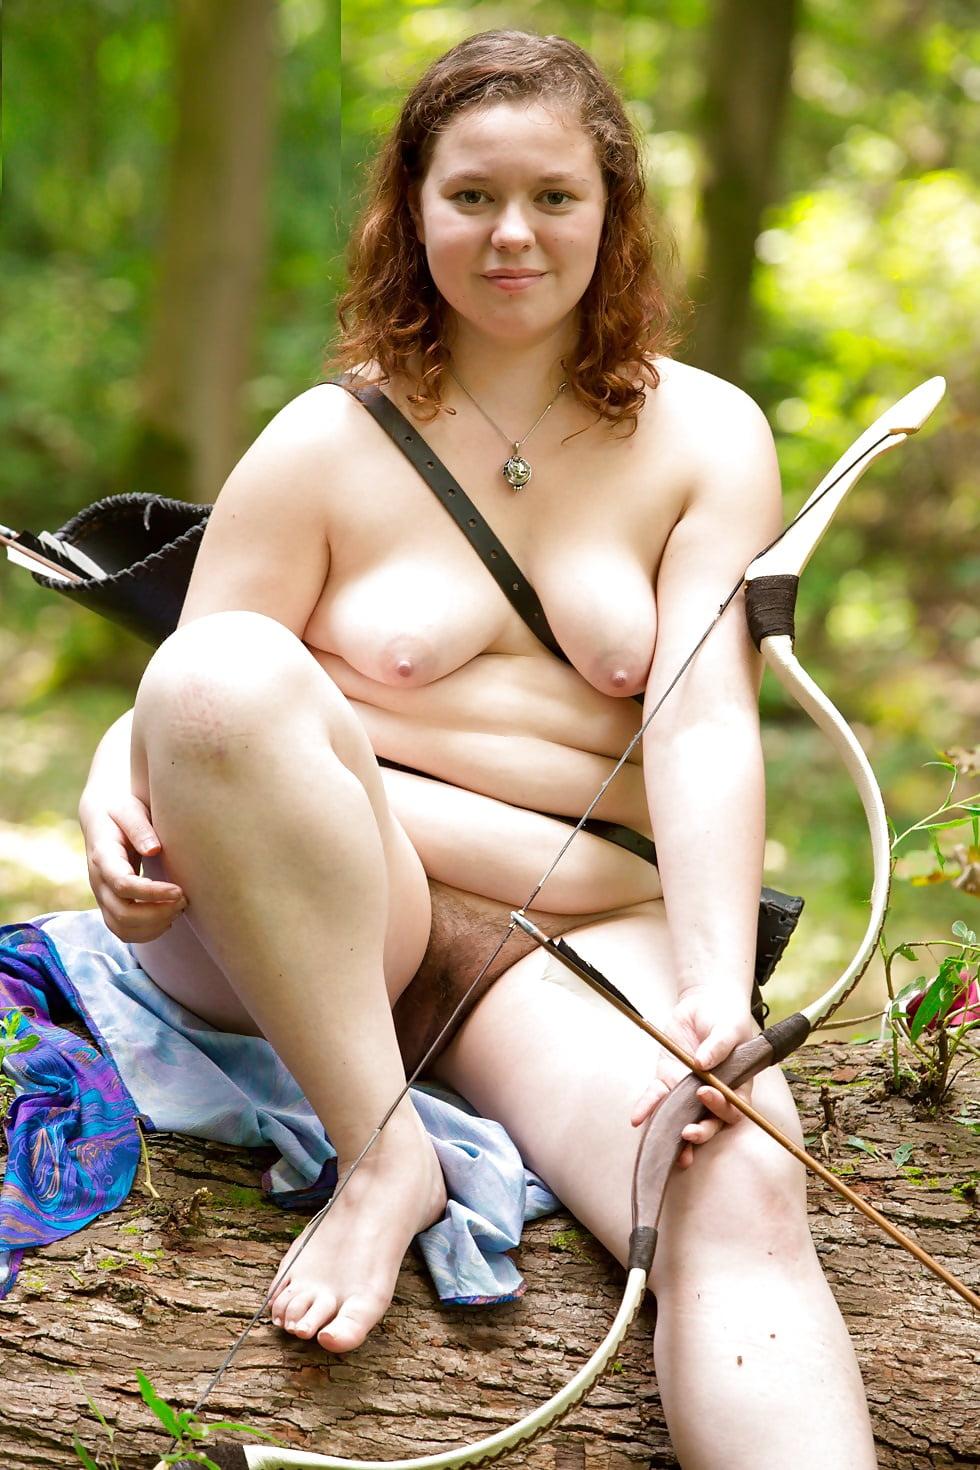 Nude Olympics, Day 6 Archery - 25 Pics - Xhamstercom-3722